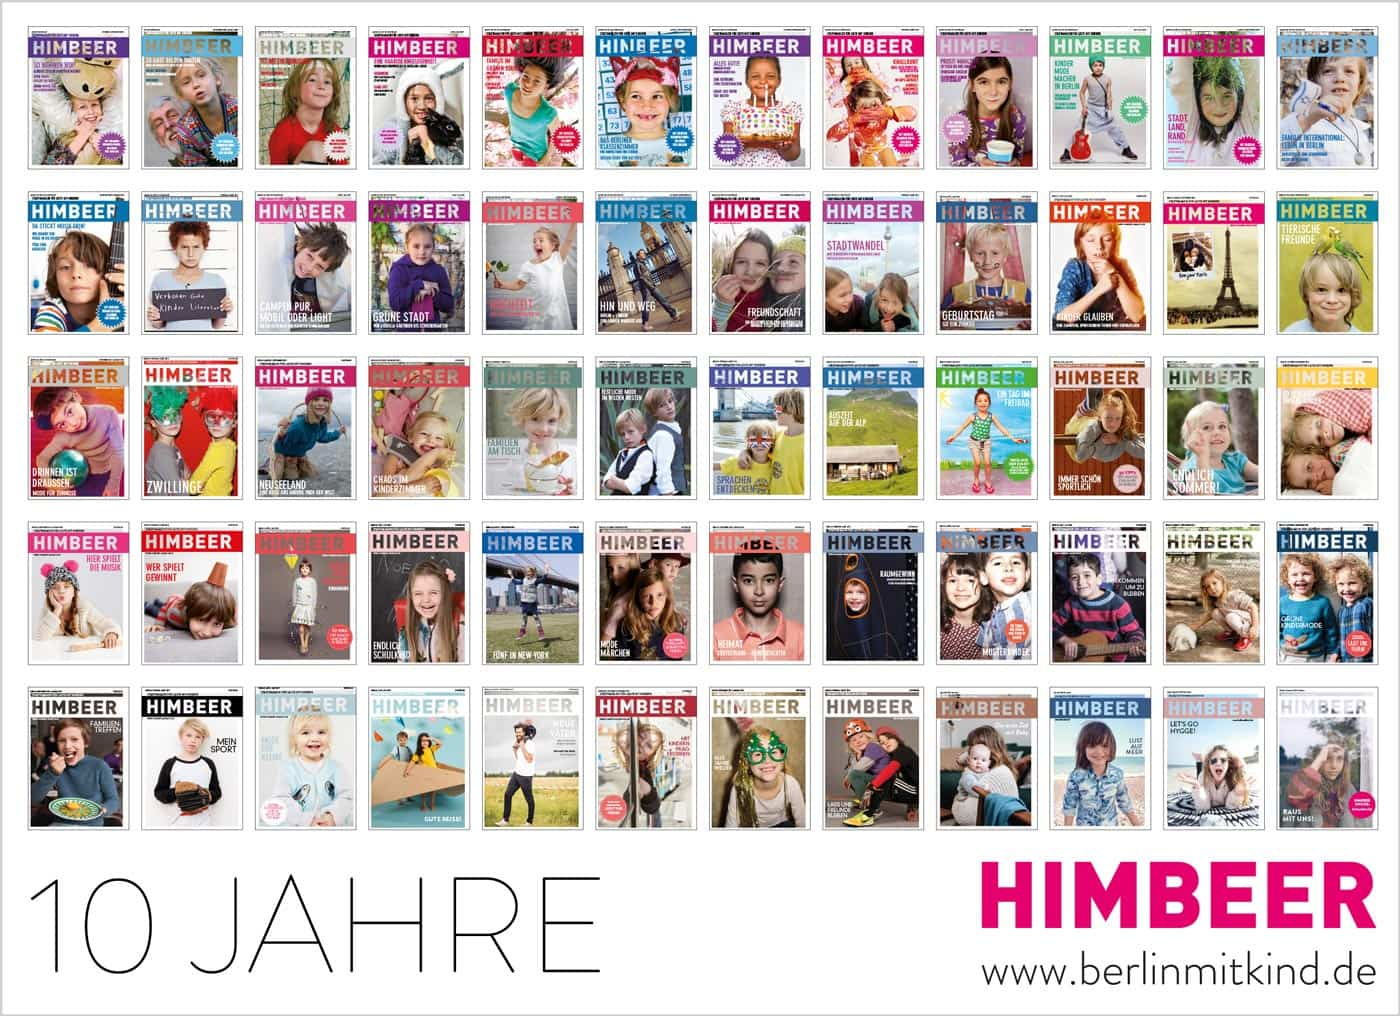 HIMBEER Magazin 10 Jahre Berlin Verlag